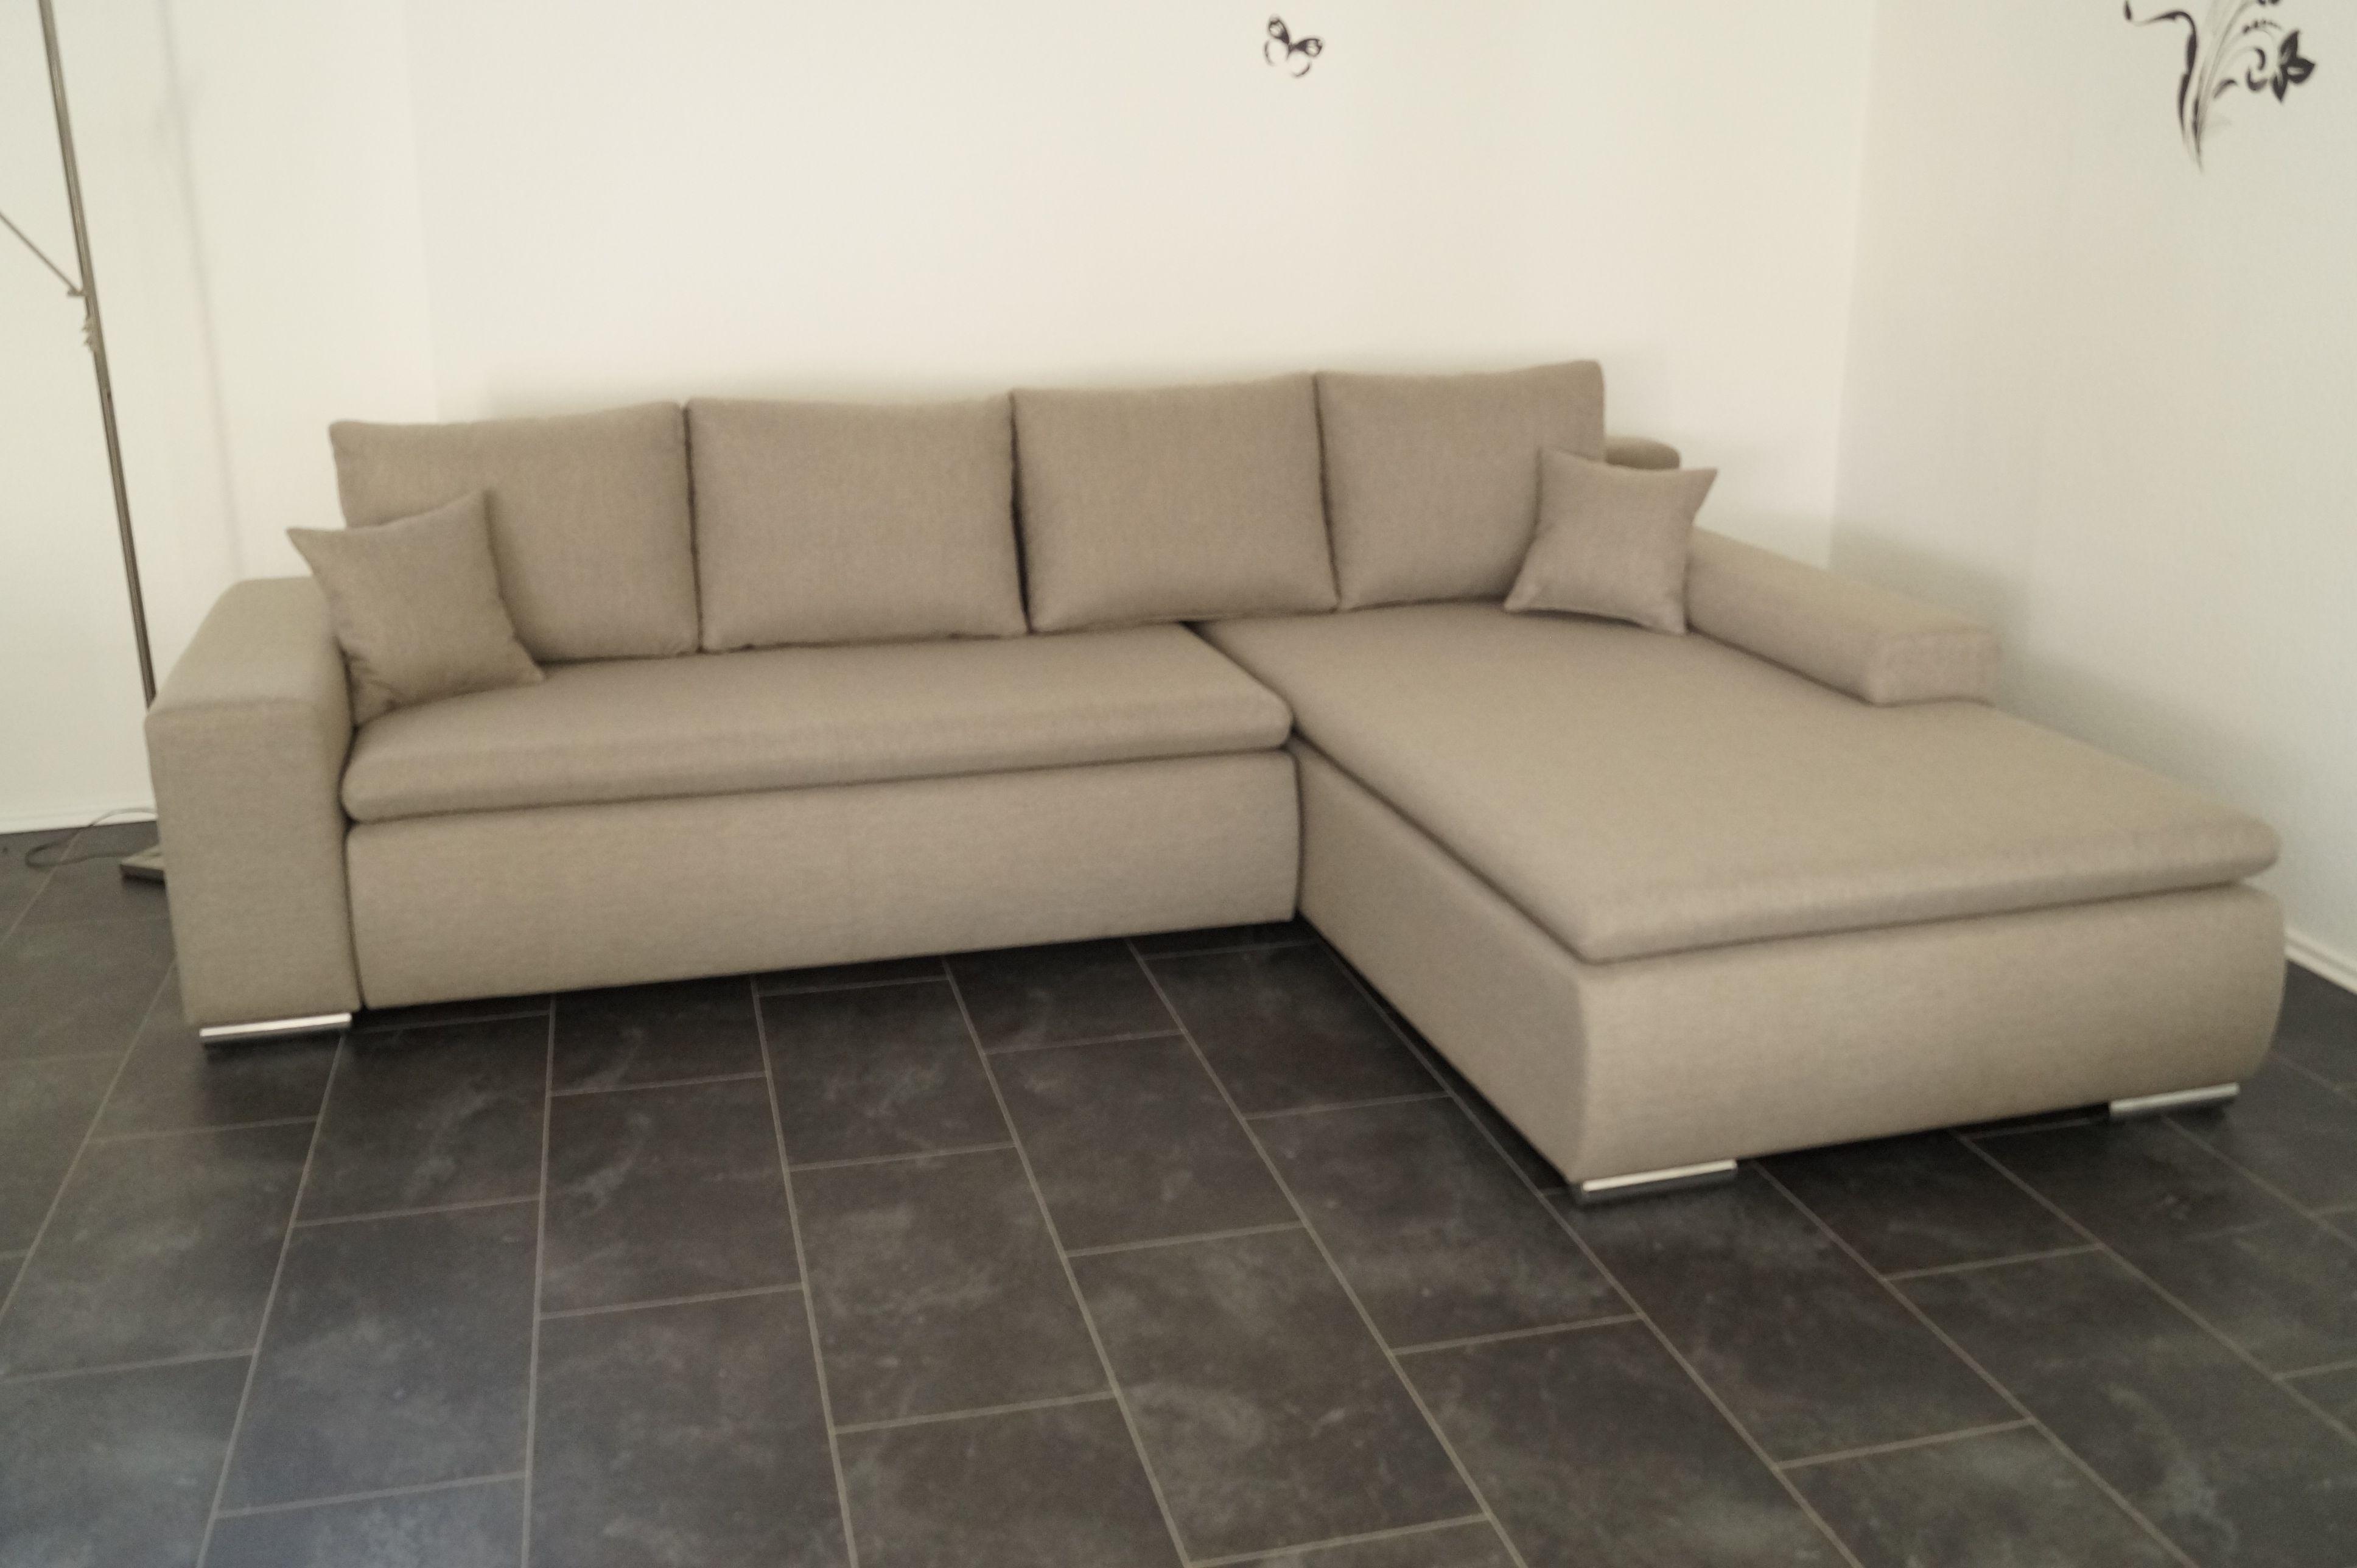 Sofa Lagerverkauf Fabrikverkauf Elkenroth Polste Wwwsofa